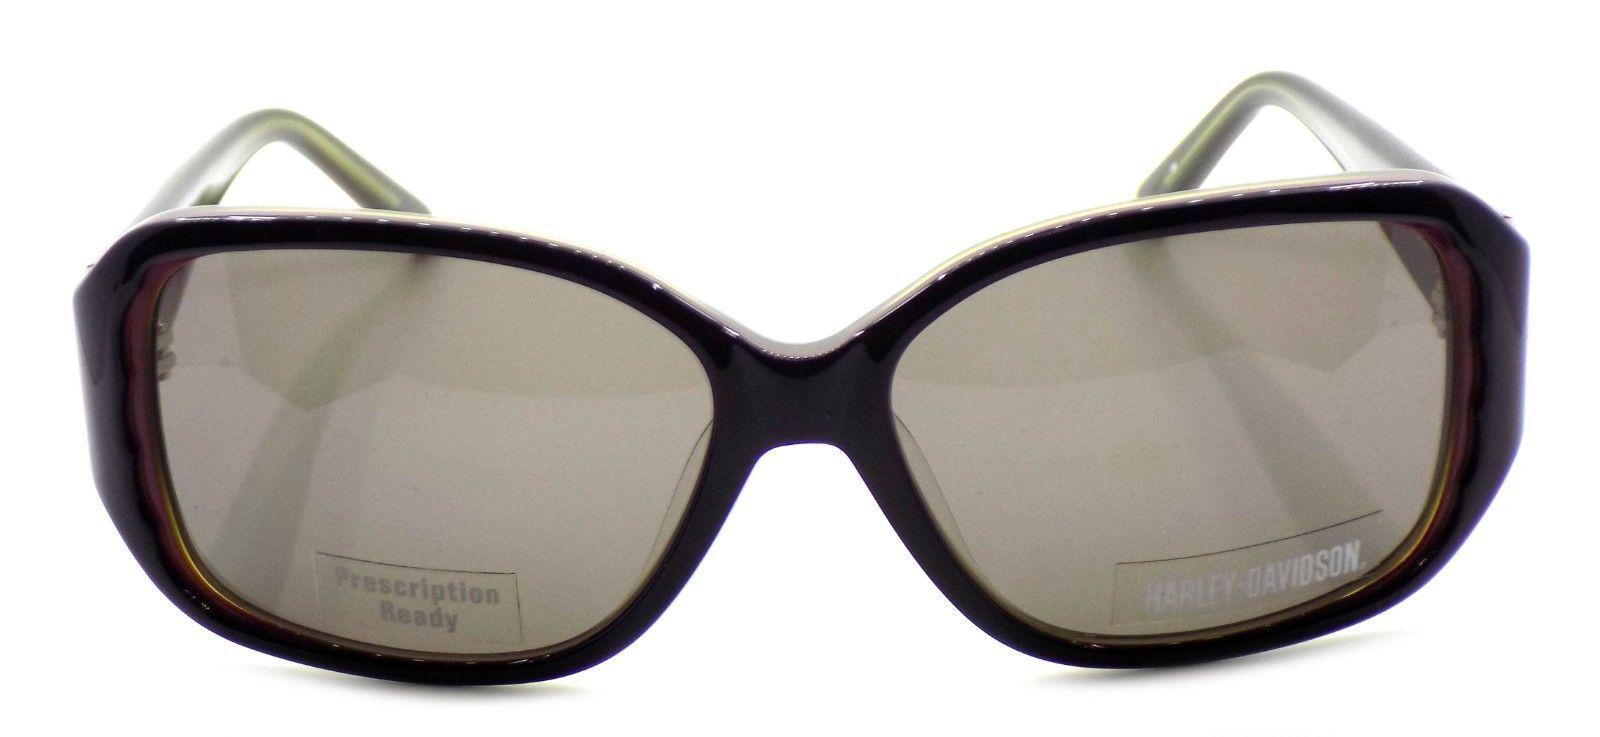 Harley Davidson HDX846 PUR-3 Women's Sunglasses Purple 56-15-130 Gray + CASE